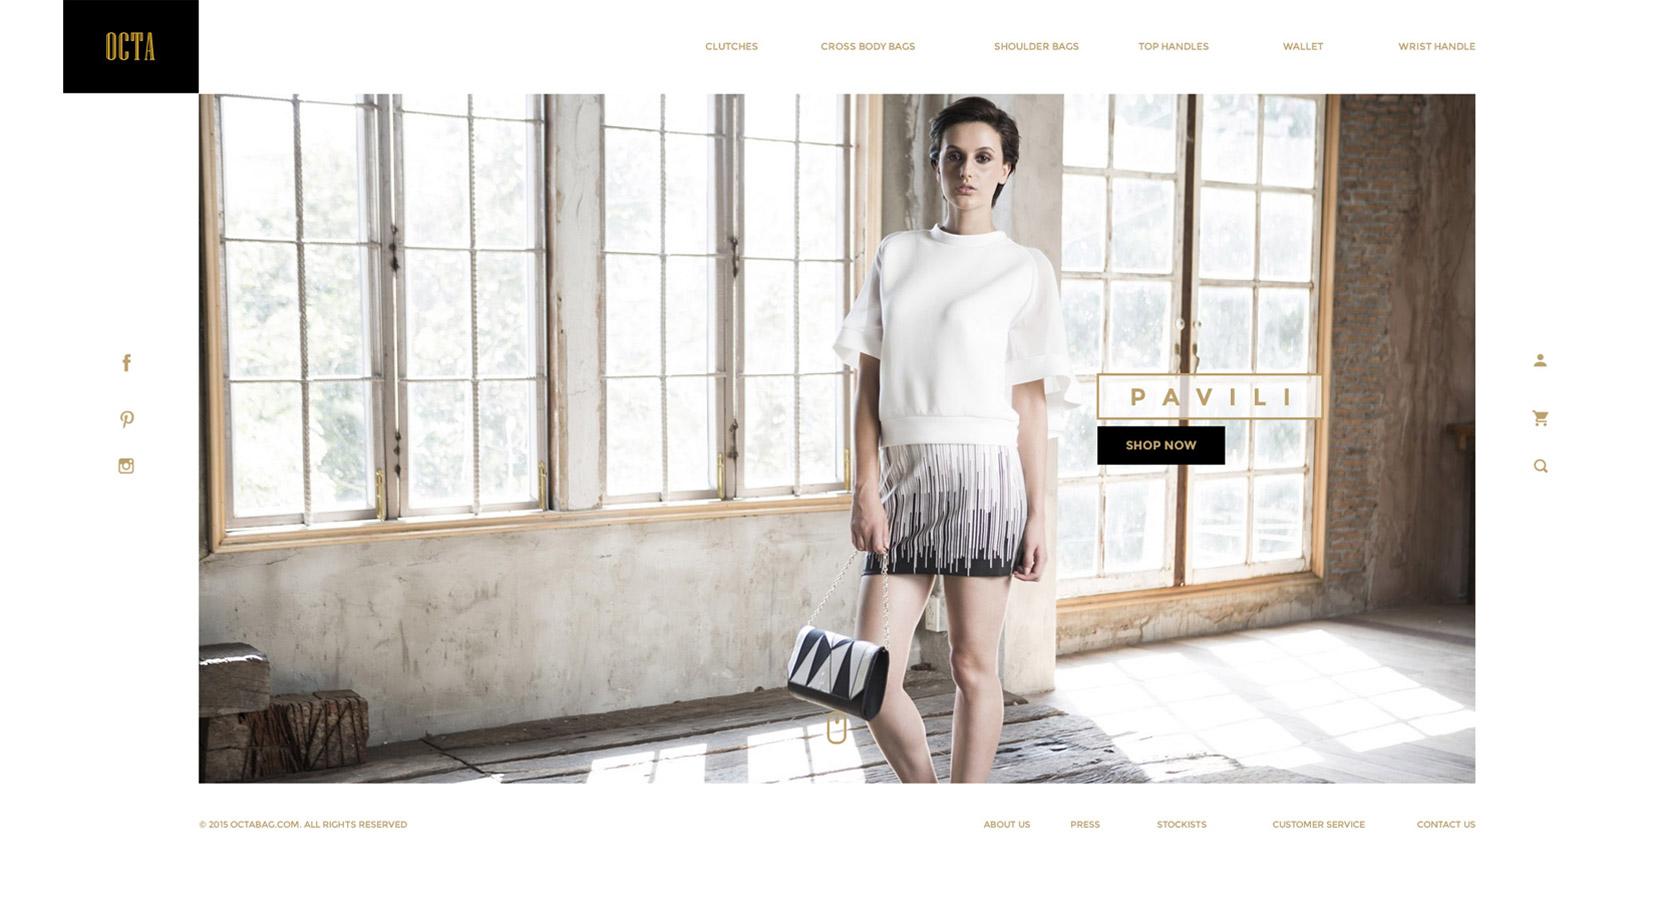 KOS Design - OCTA Bag